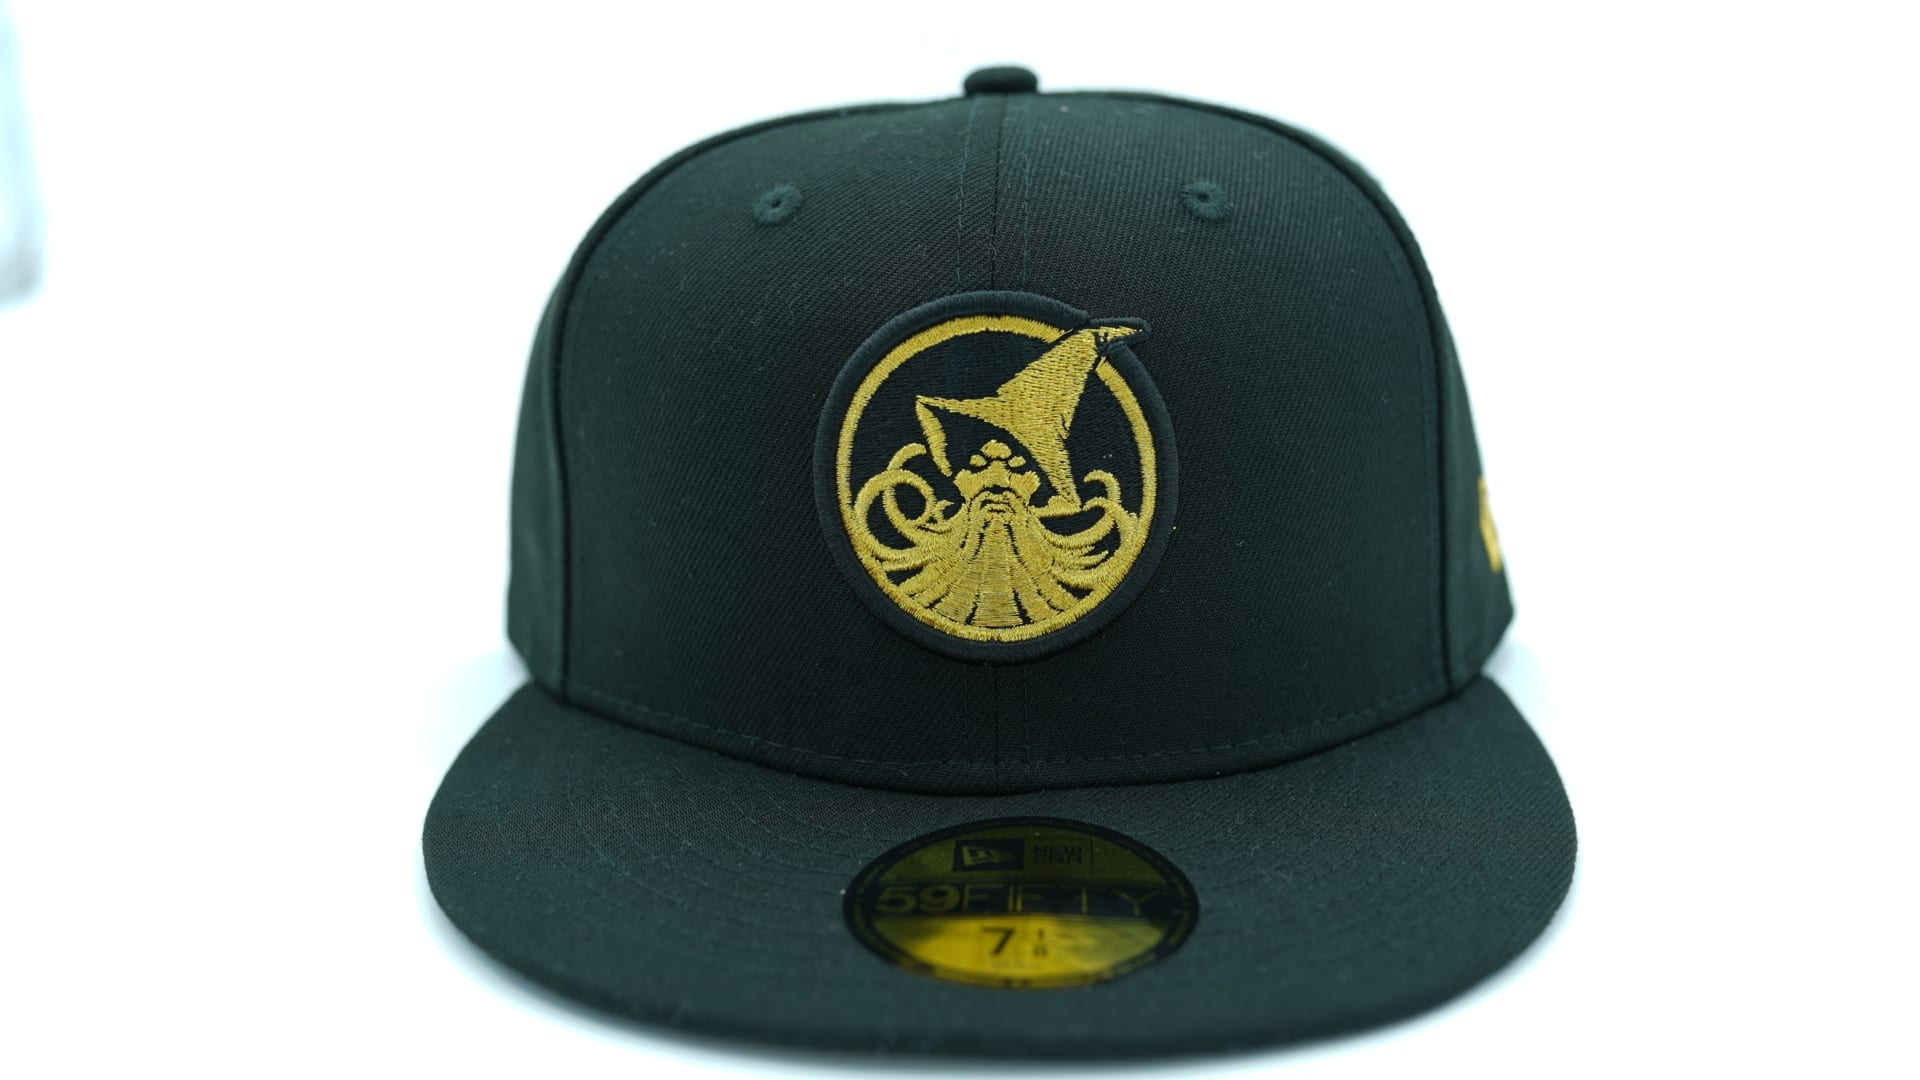 king-stampede celeb fitted baseball cap new era 59fifty buckshot blackmoon